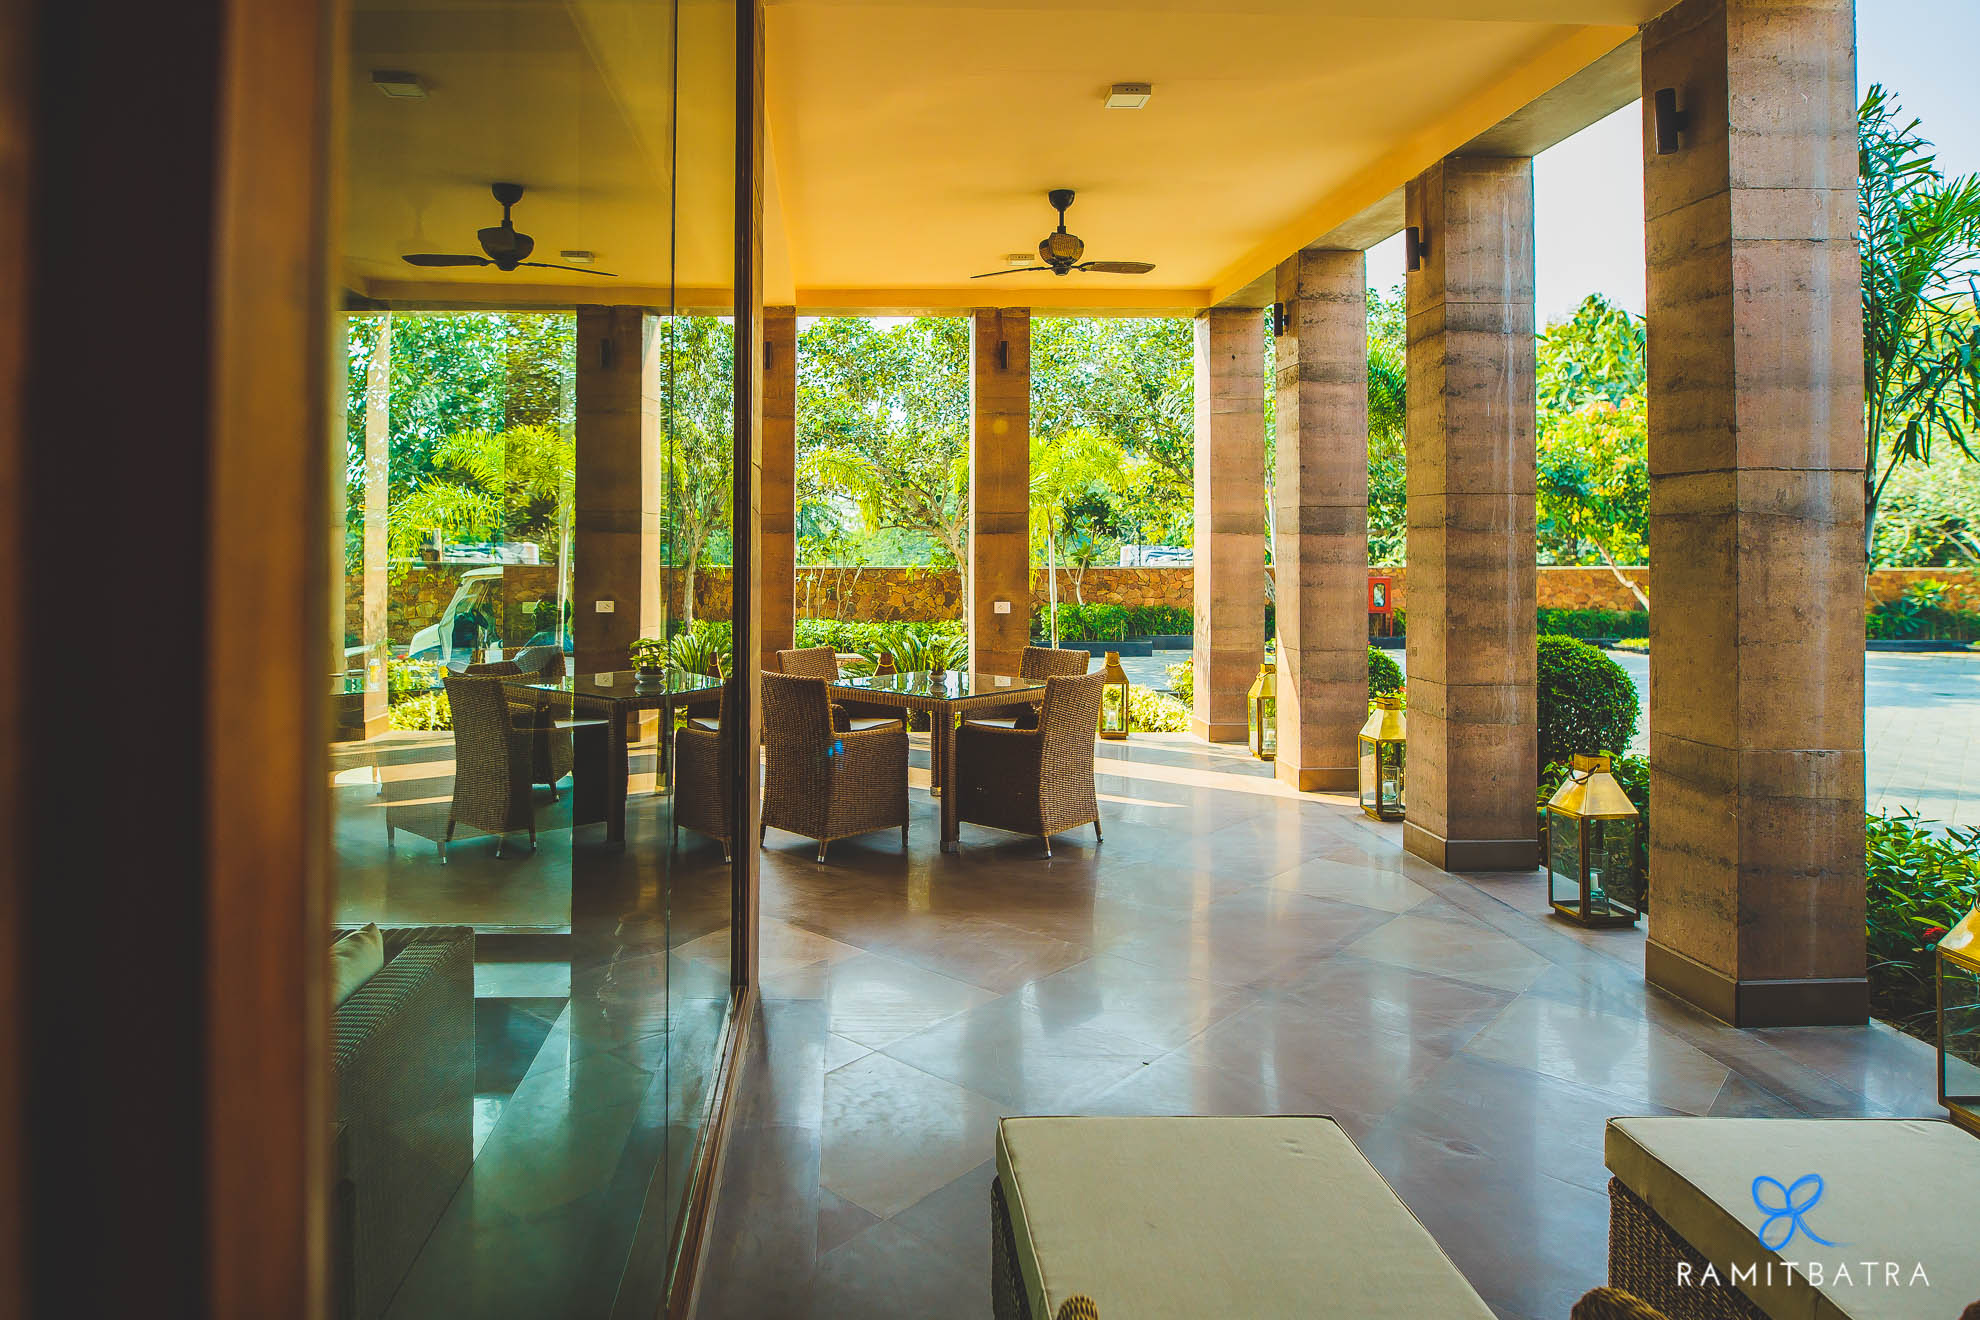 lalit-mangar-hotel-near-delhi-ramitbatra-004